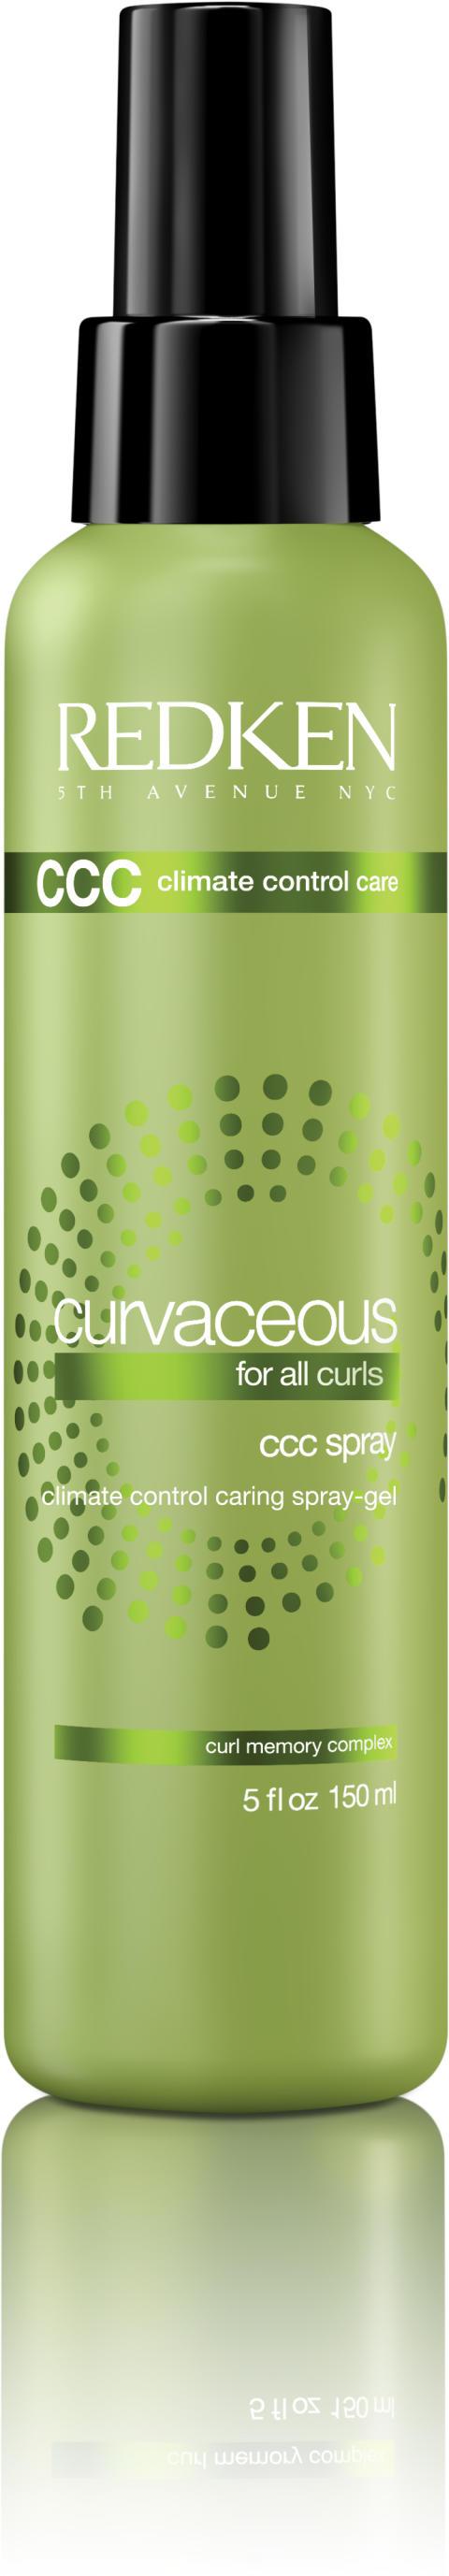 Curvaceous_CCCspray_SEK 250